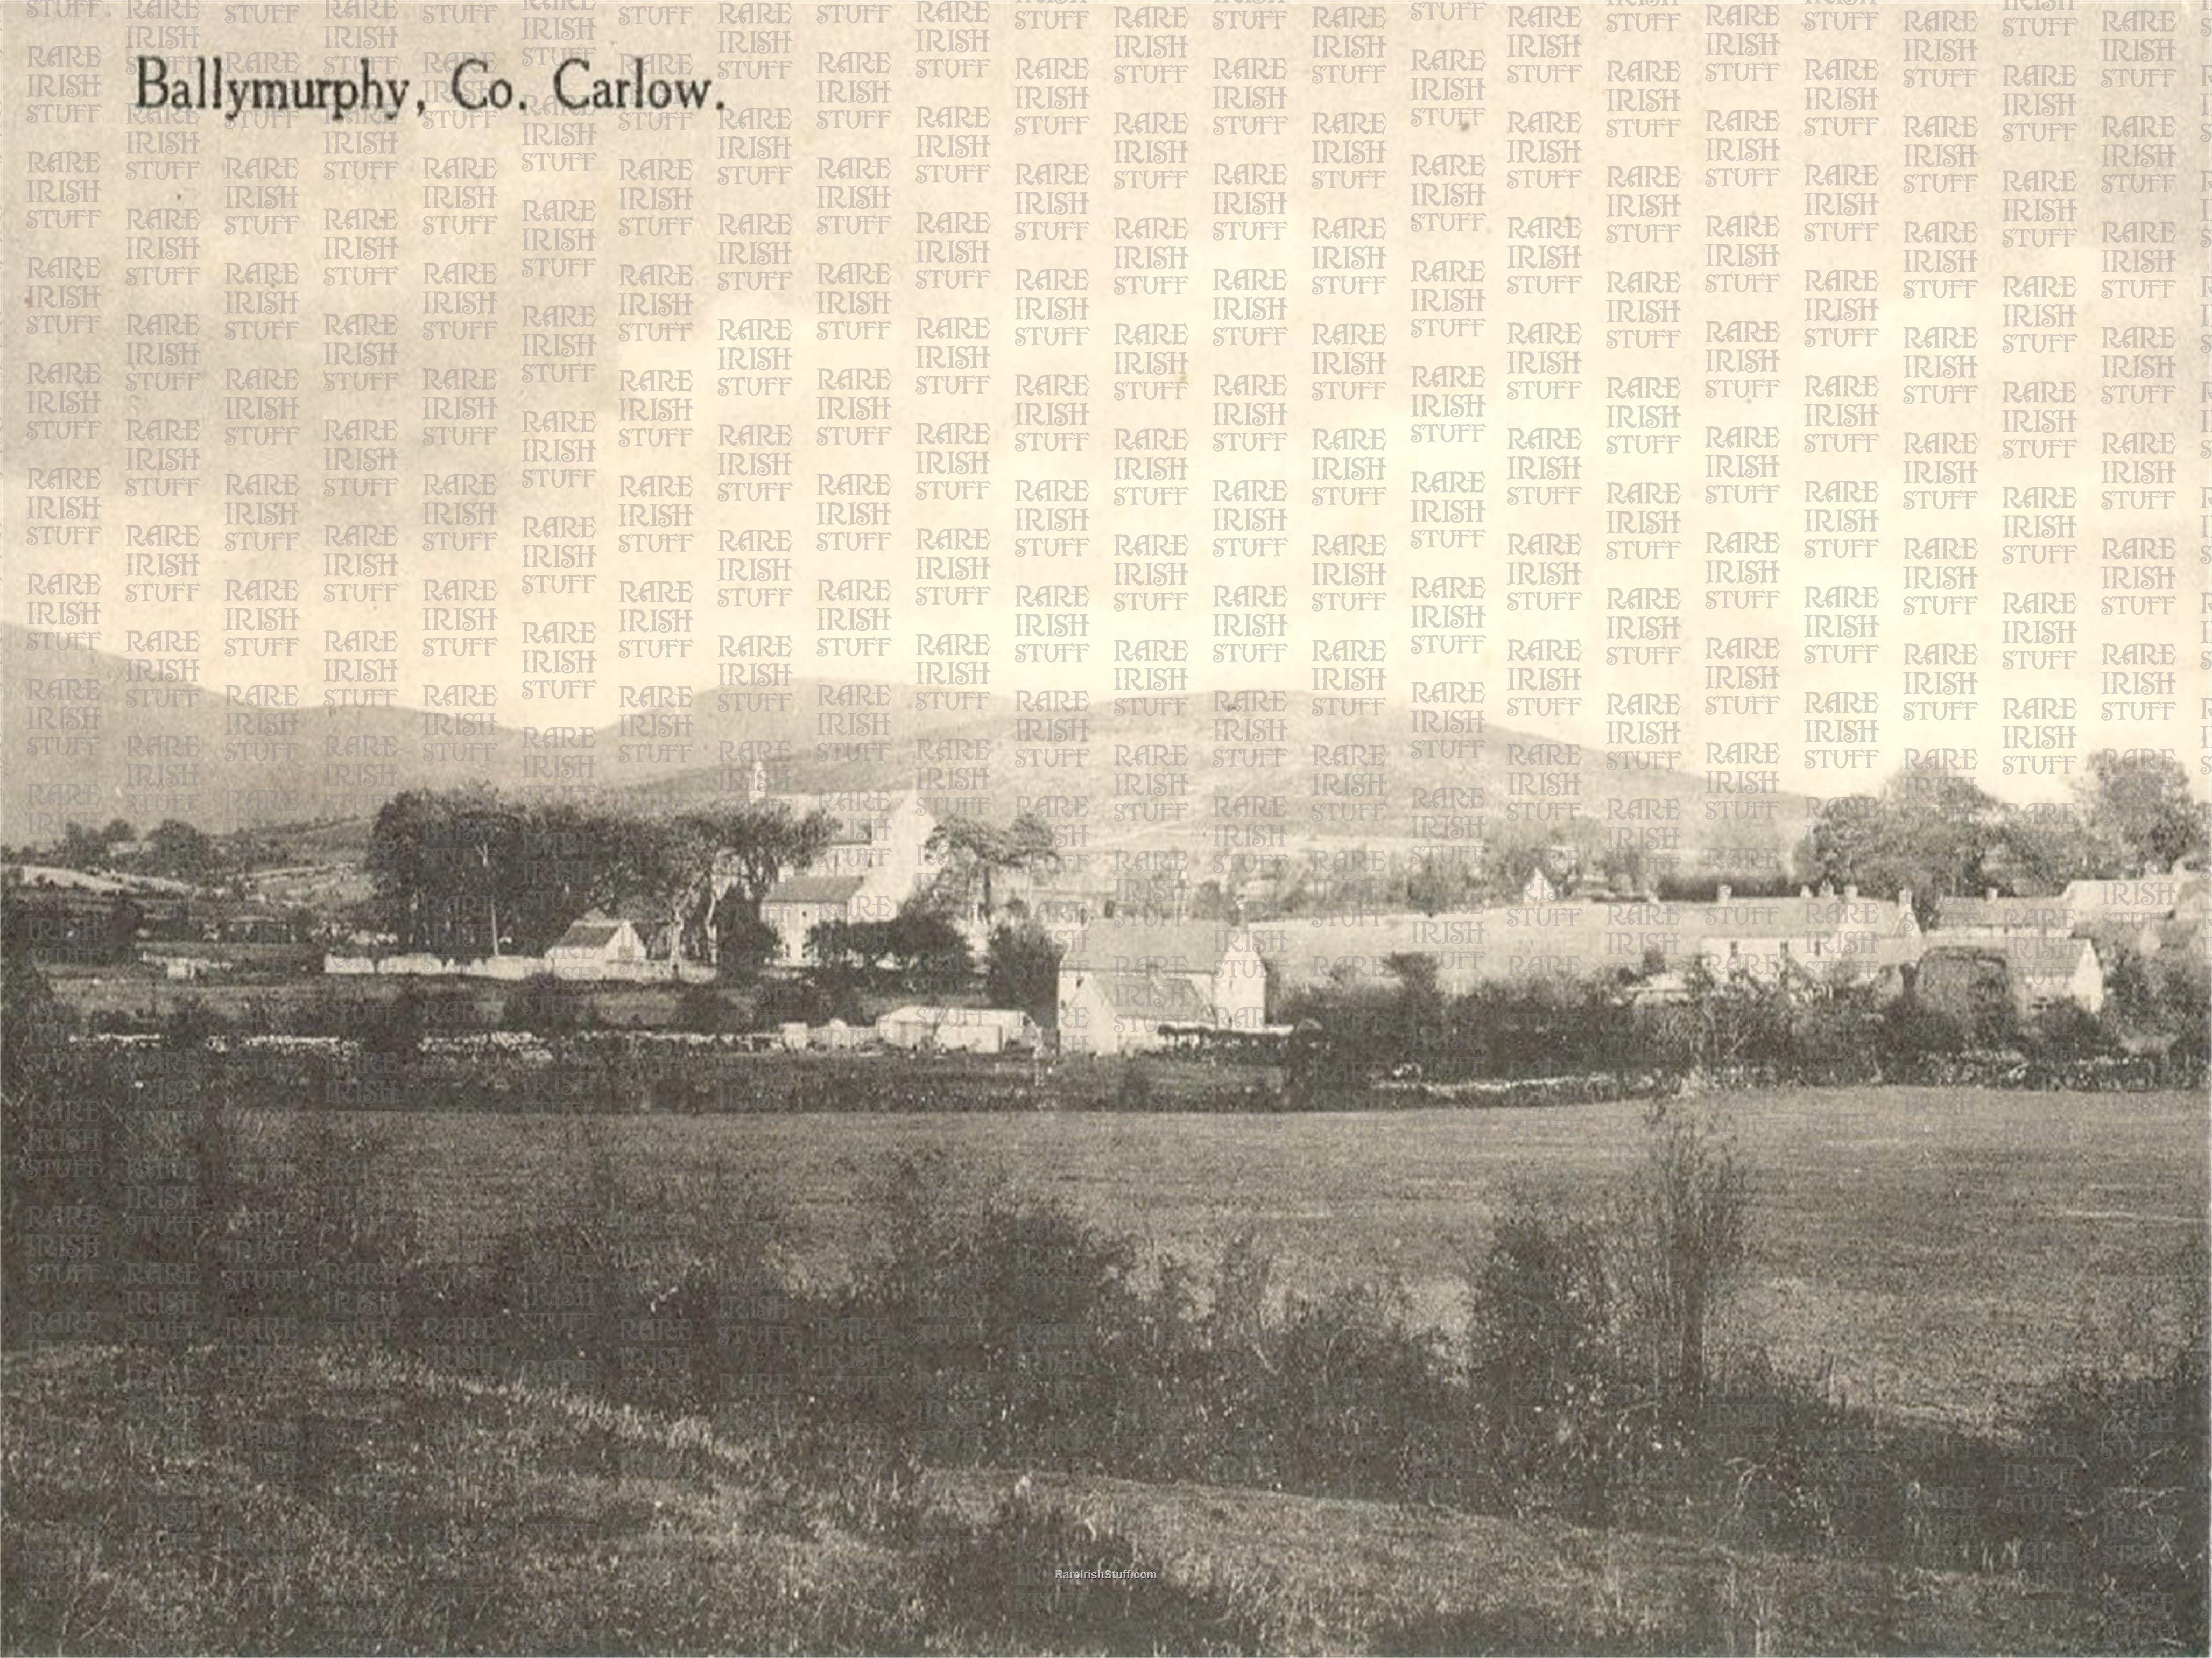 1  Ballymurphy    Co.  Carlow   Ireland 1930  Thumbnail0